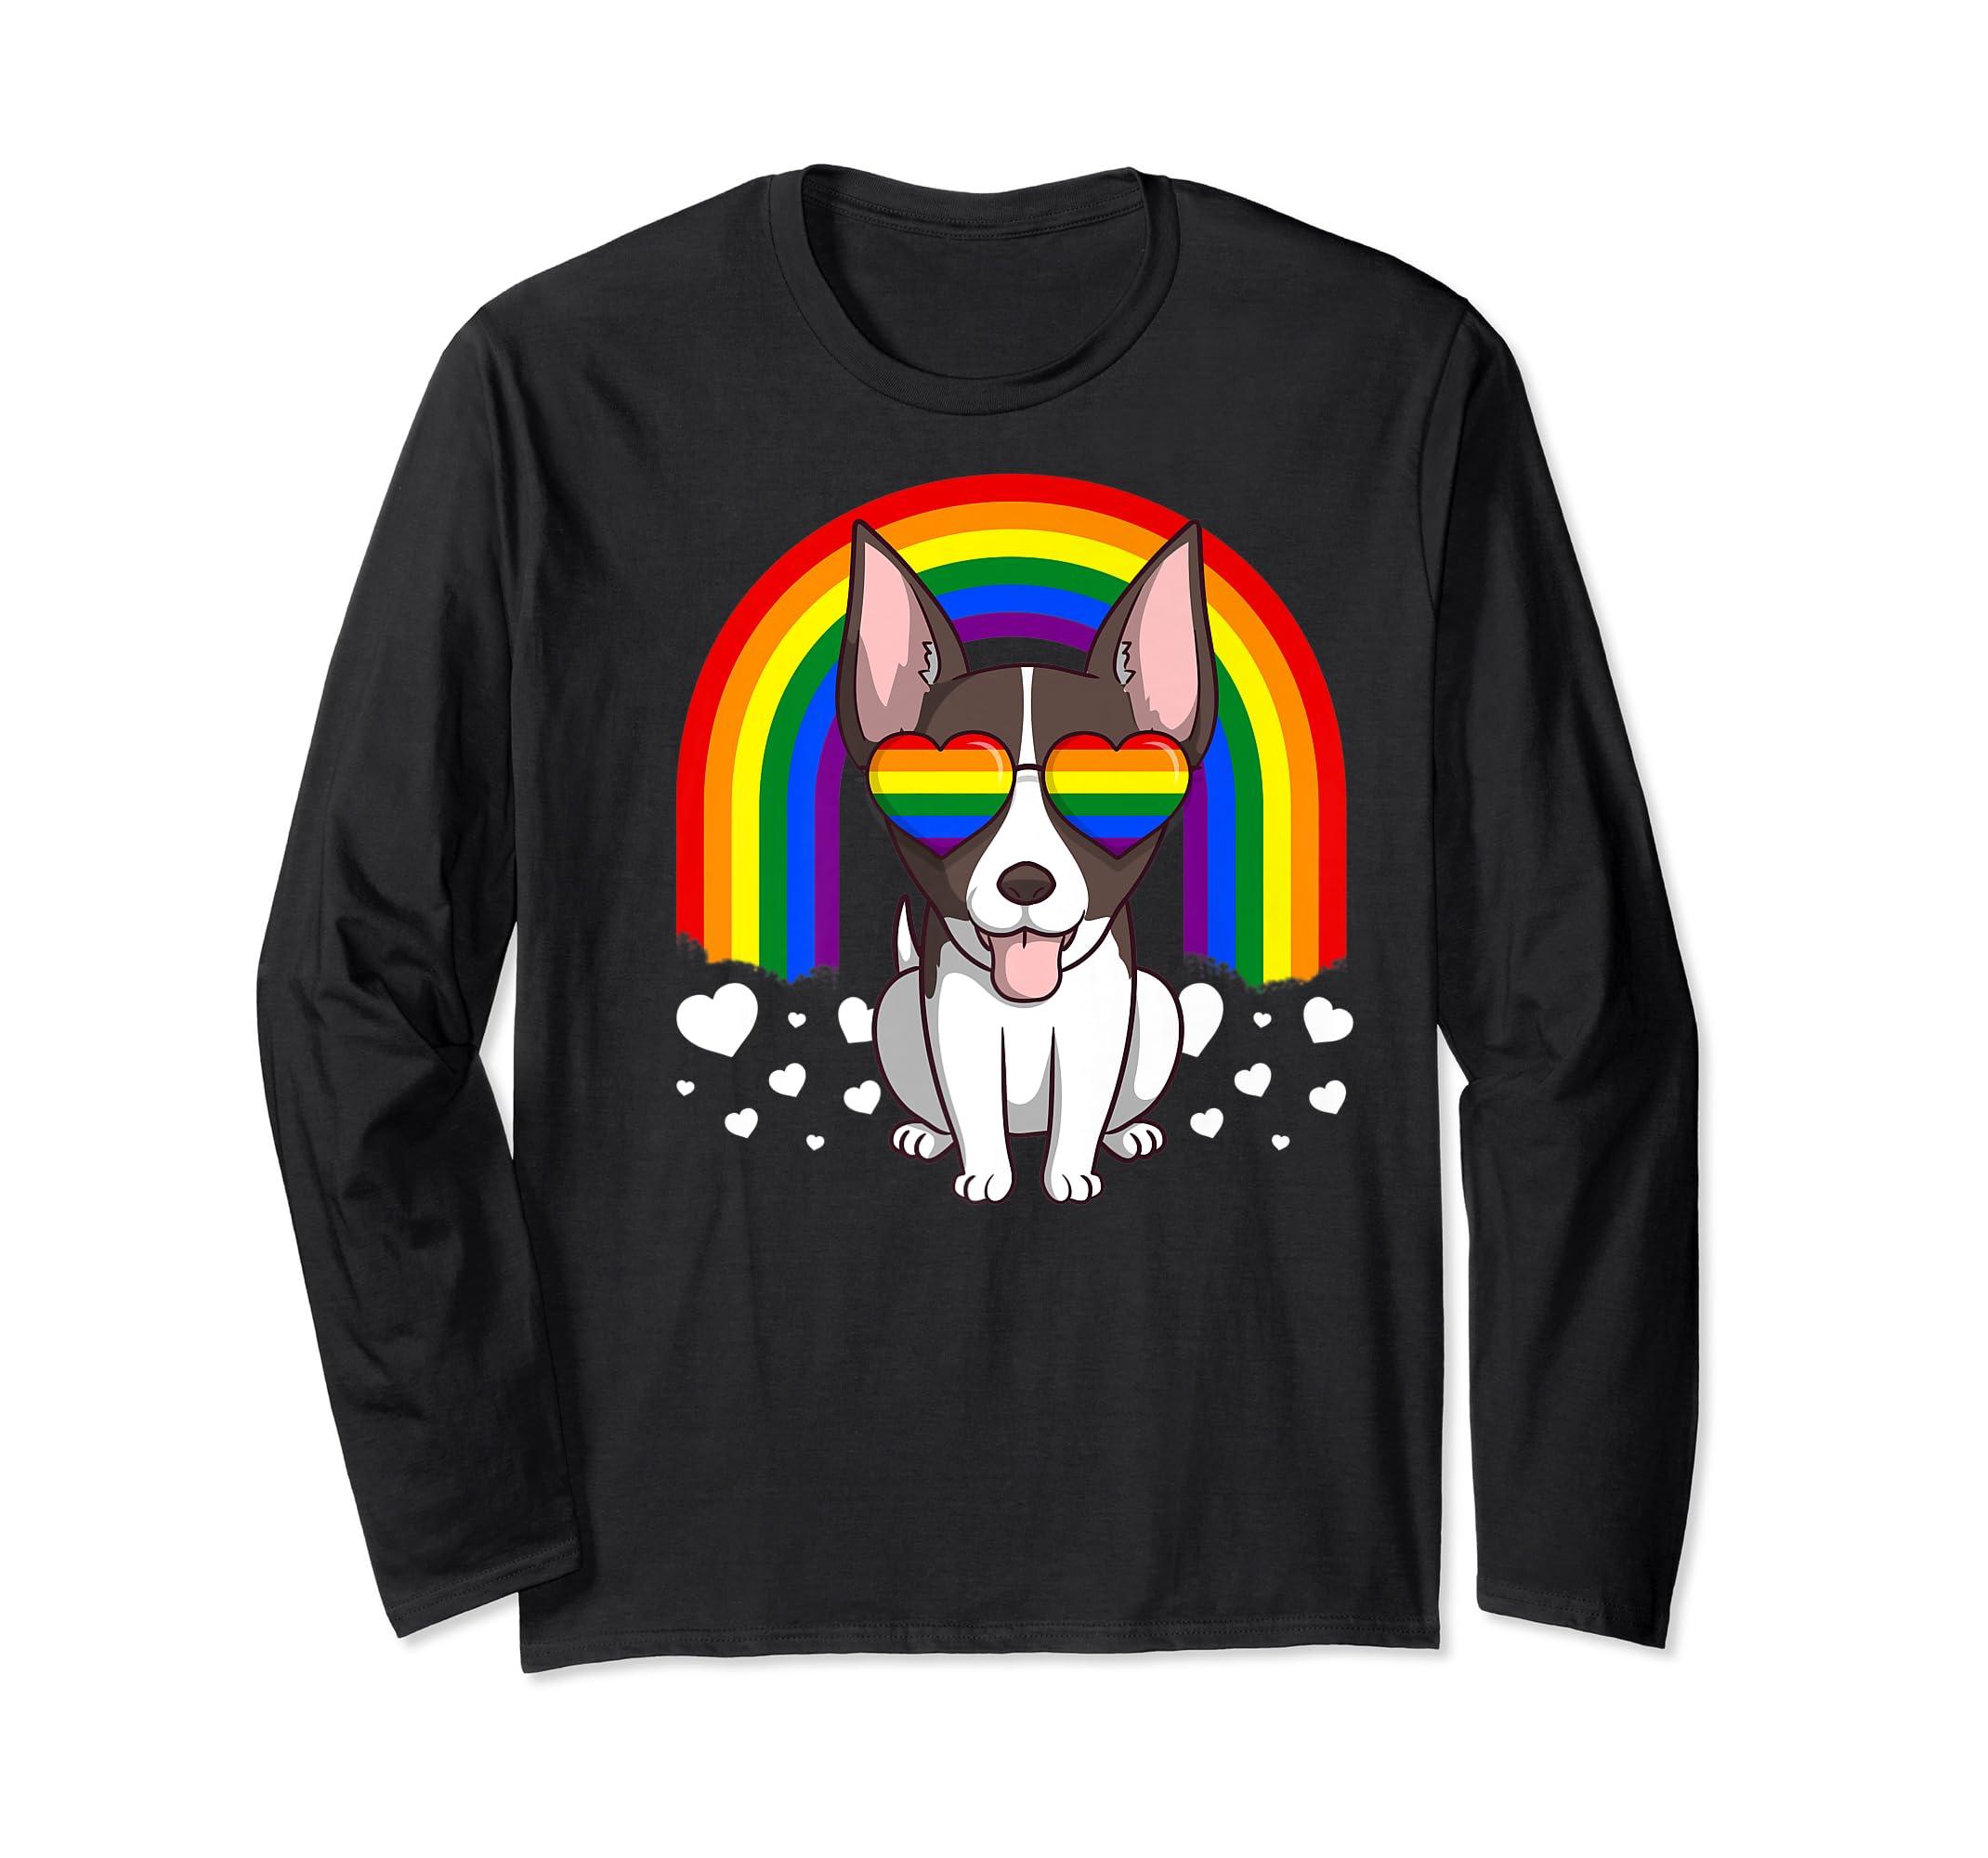 LGBT Rat Terrier Dog Gay Pride Rainbow LGBTQ Cute Gift Premium T-Shirt-Long Sleeve-Black